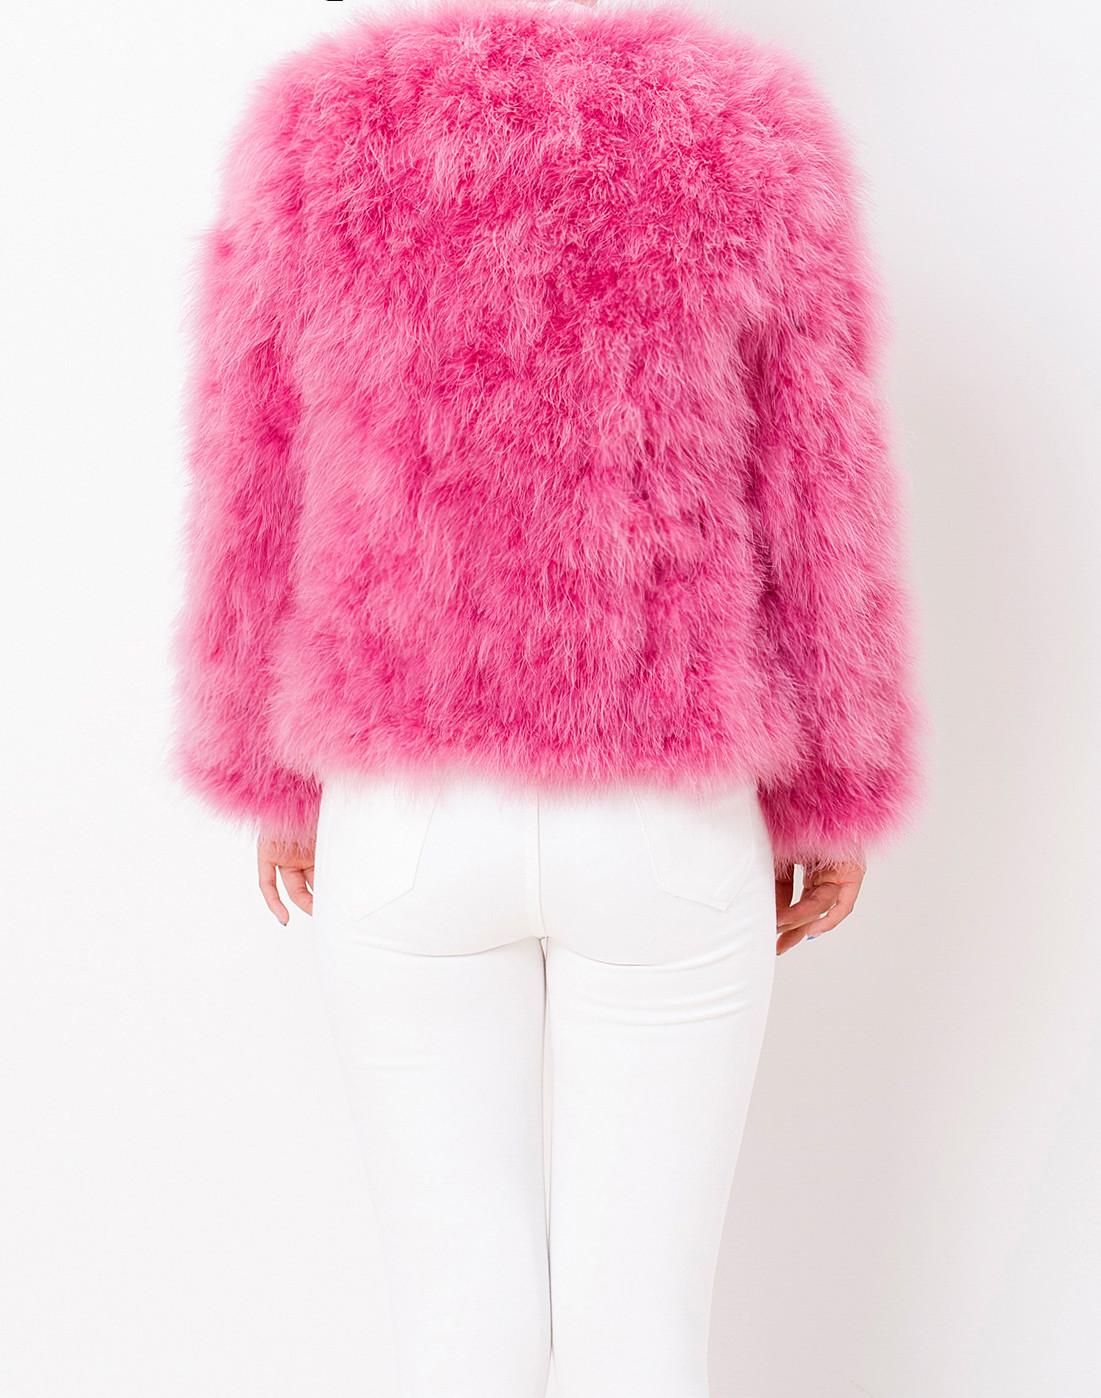 Fluffy Fur Fever Jacket Raspberry Pink - Pellobello